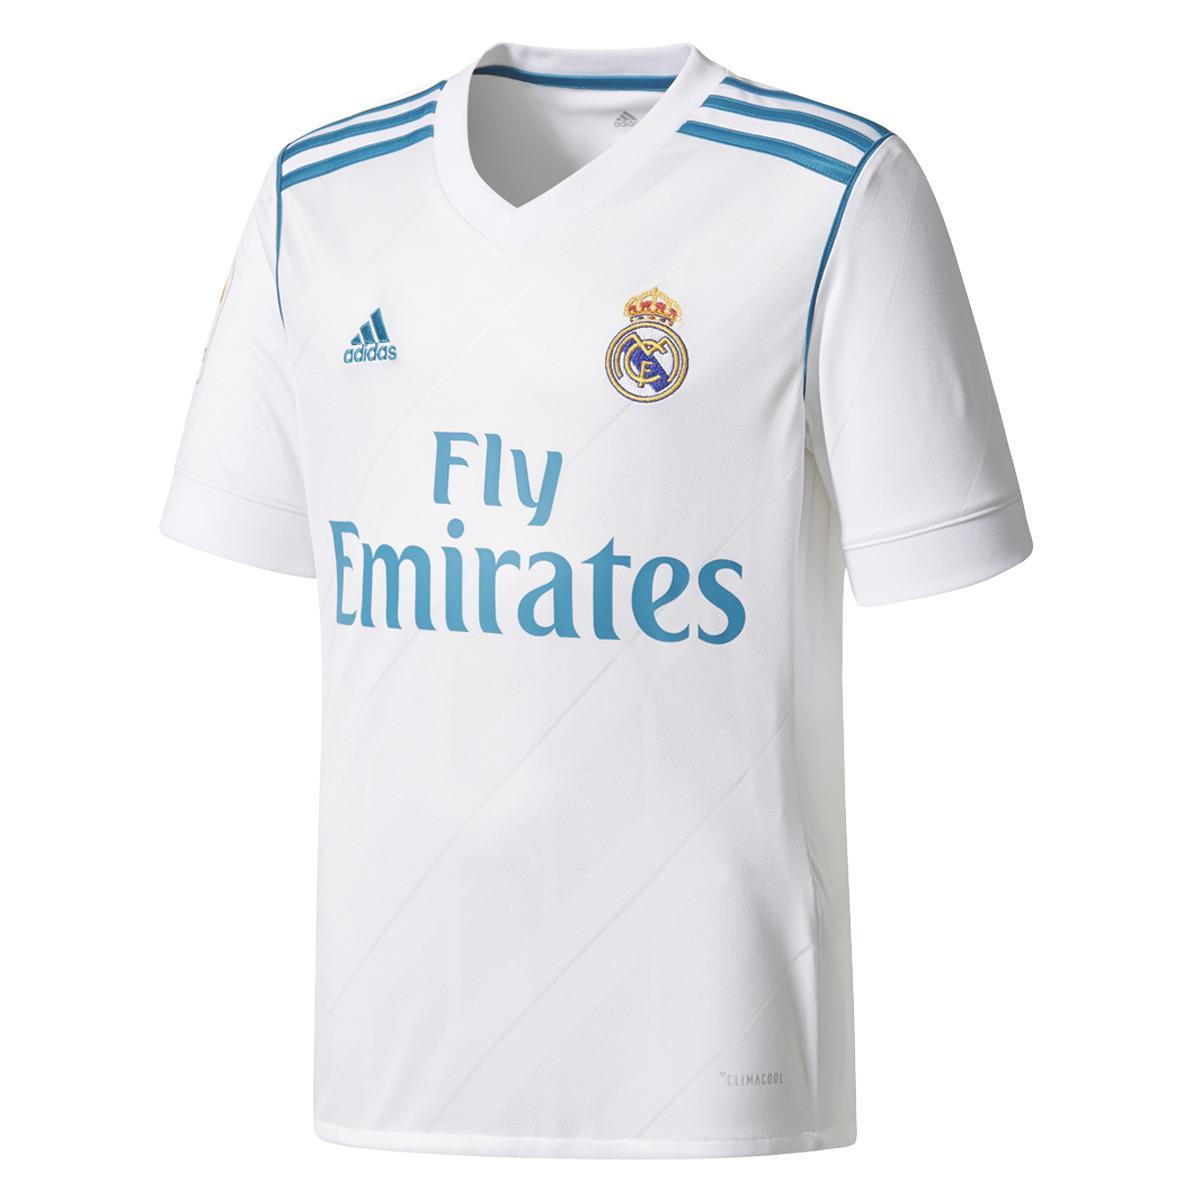 874363fea Adidas - White Real Madrid Cf 2017-2018 Asensio Home Strip T-shirt for.  View fullscreen